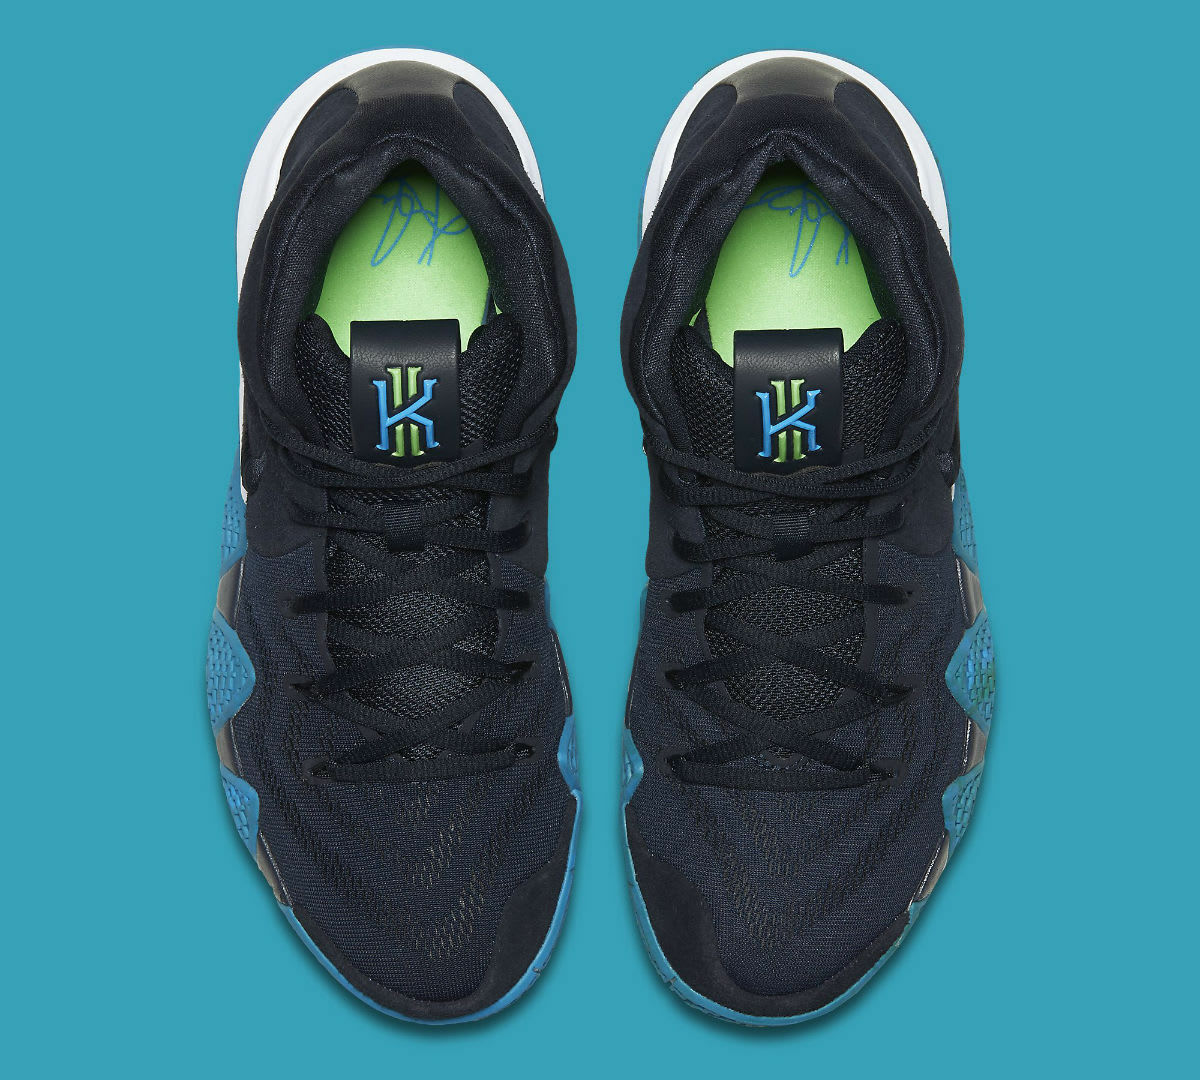 Nike Basket Kyrie 4 Basket Nike Scarpa Uomini Dimensioni 9 350a7e